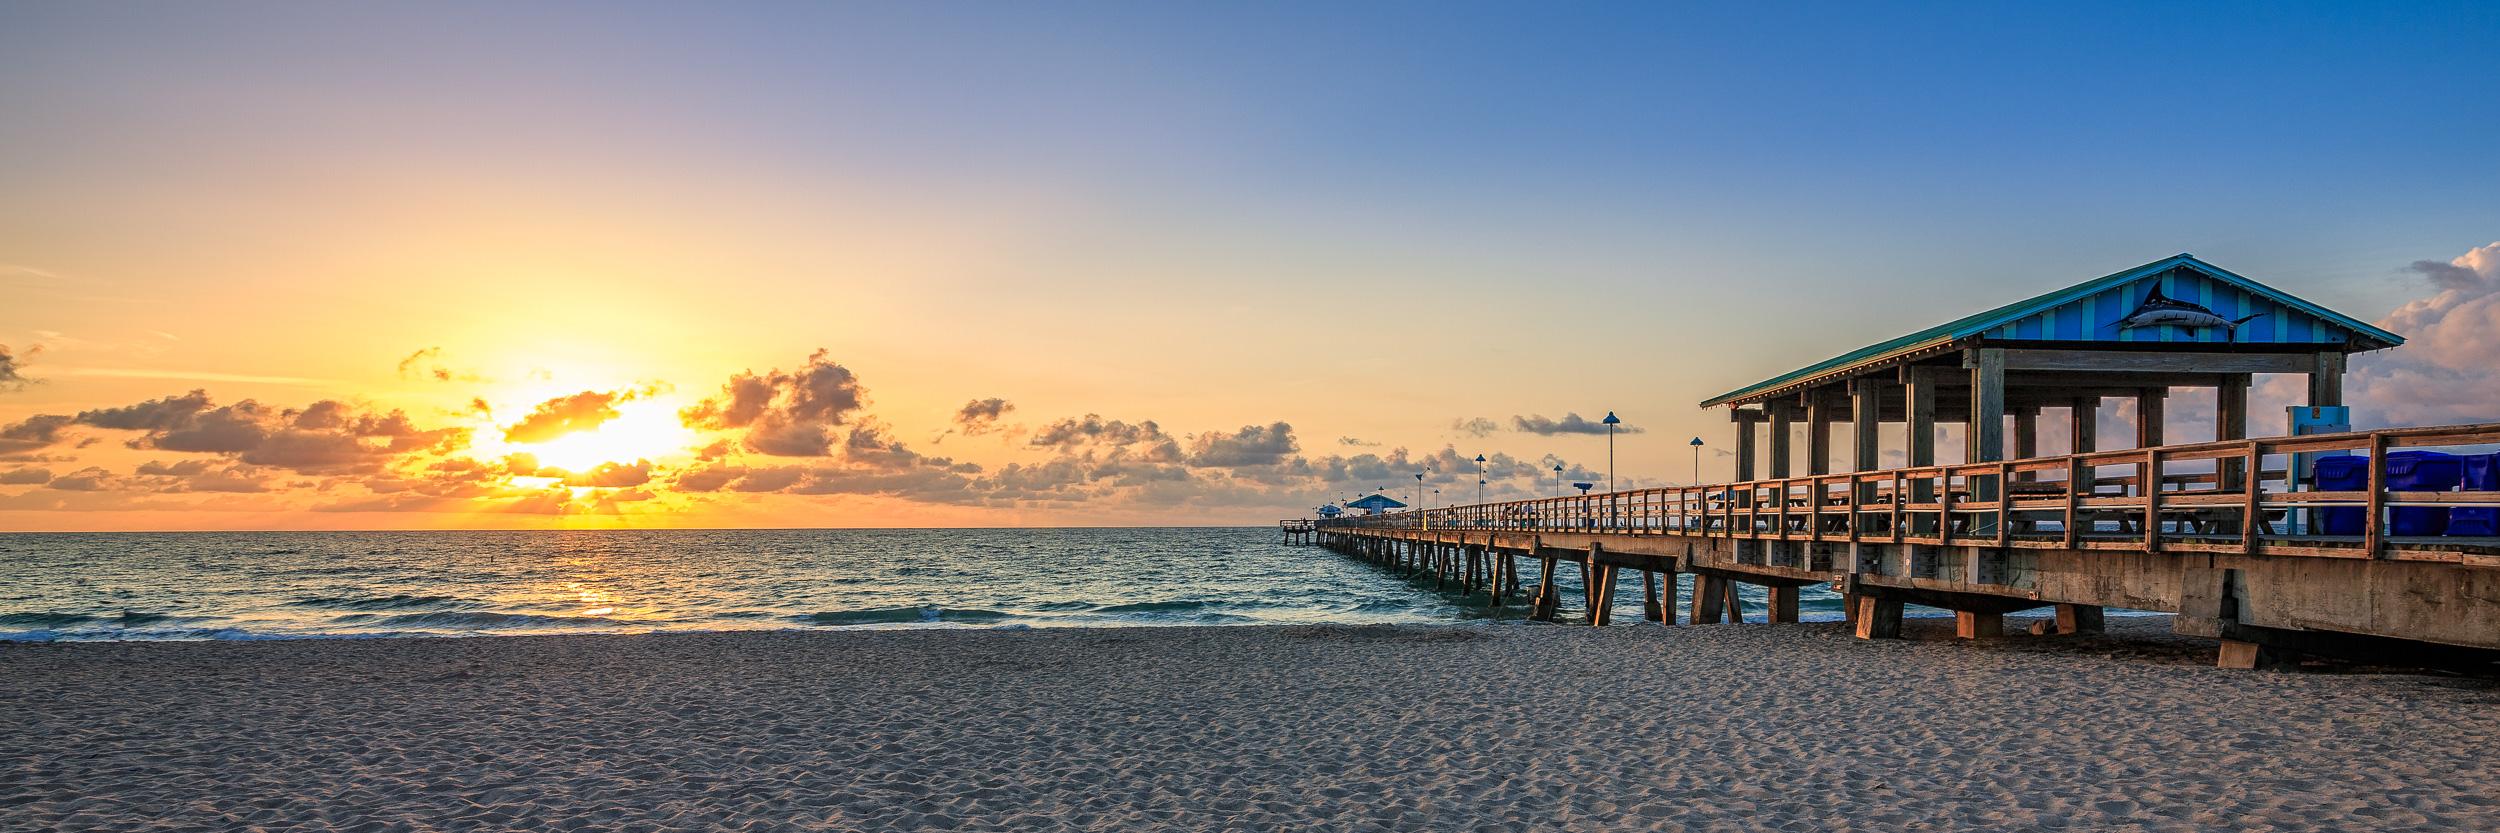 anglins_fishing_pier_sunrise_Miami_Fort_Lauderdale_commercial_photographer_Franklin_Castillo-2-Edit.jpg